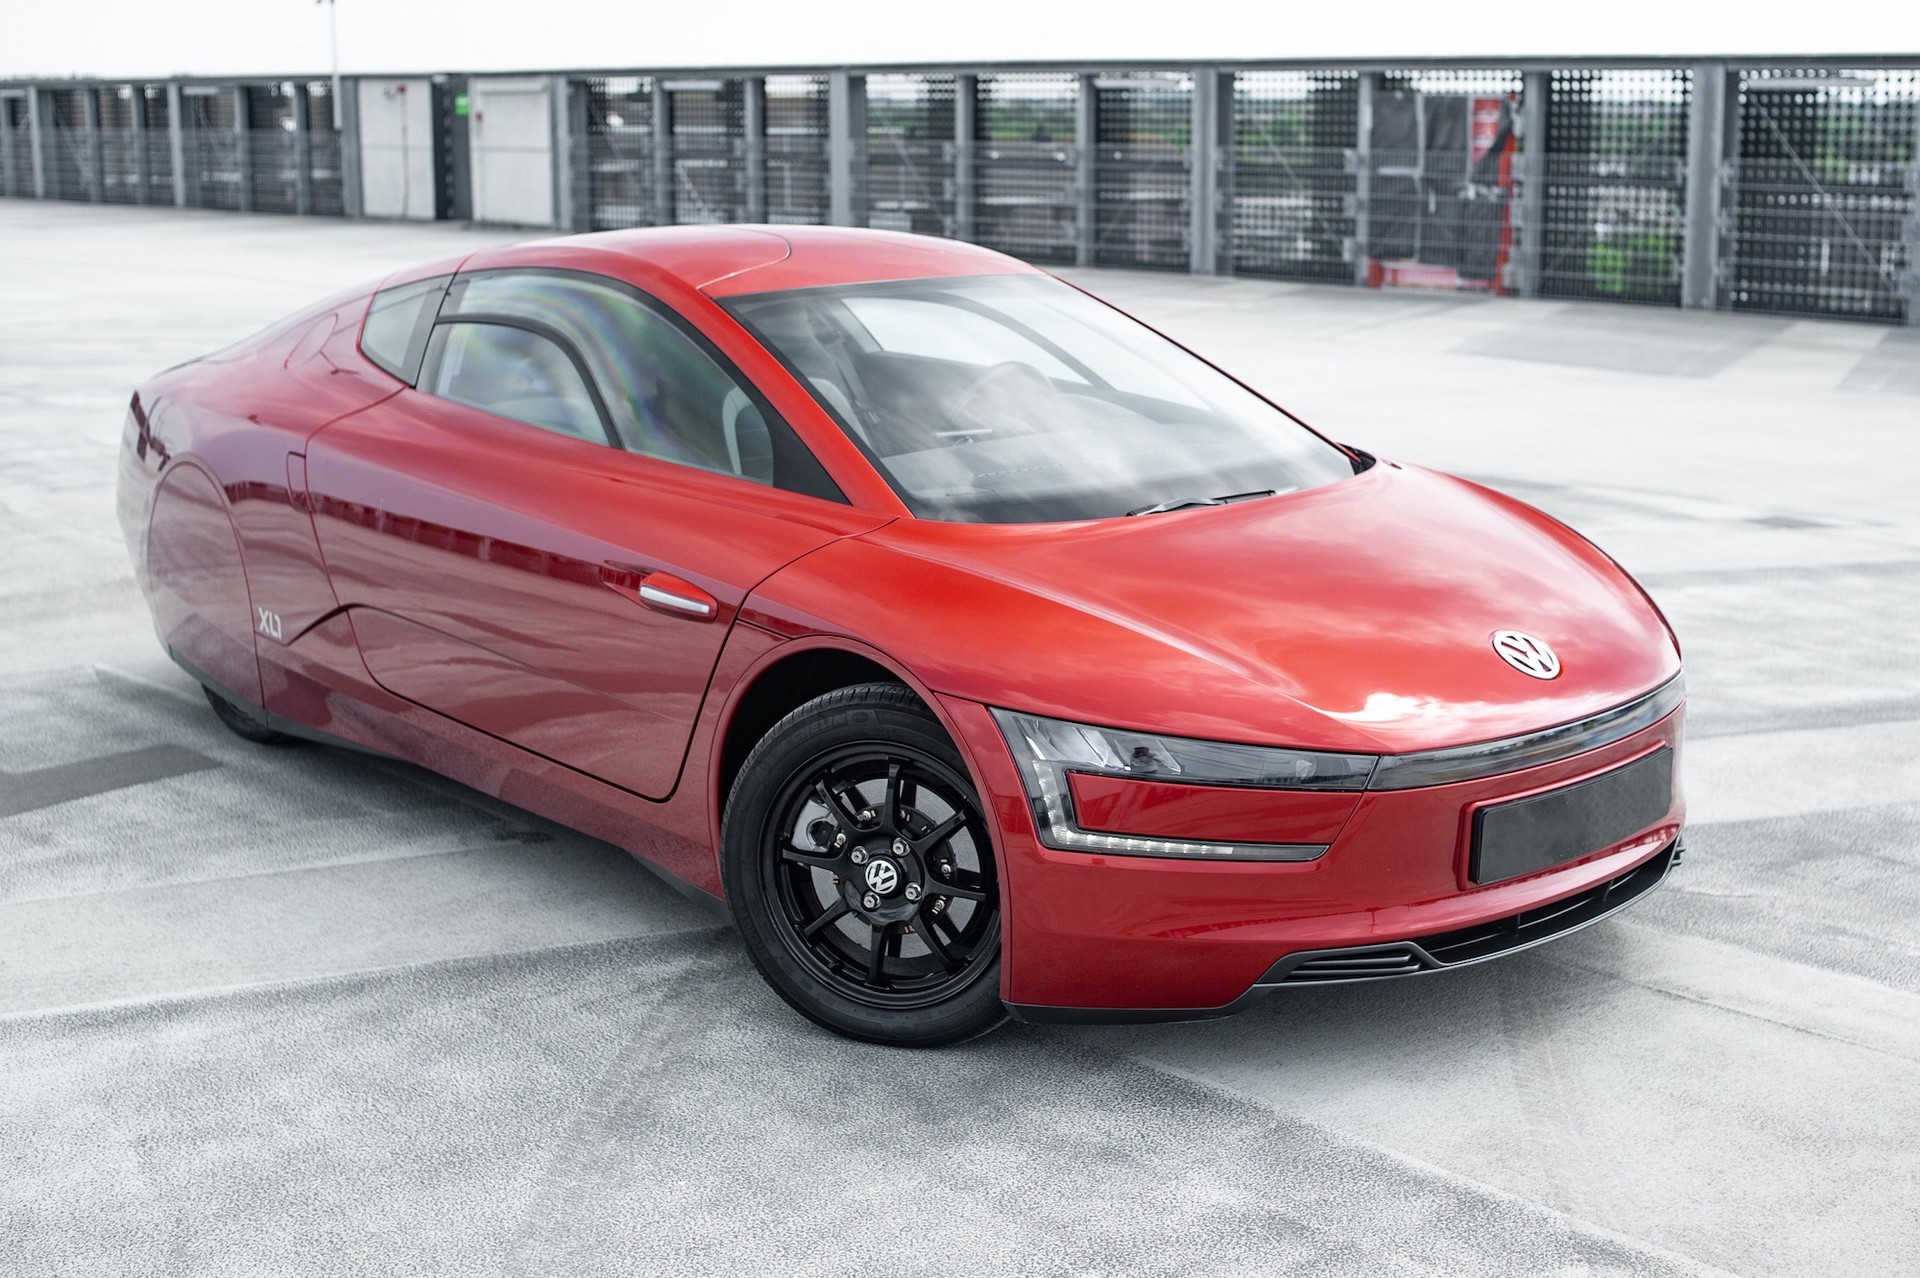 Volkswagen_XL1_sale-0033